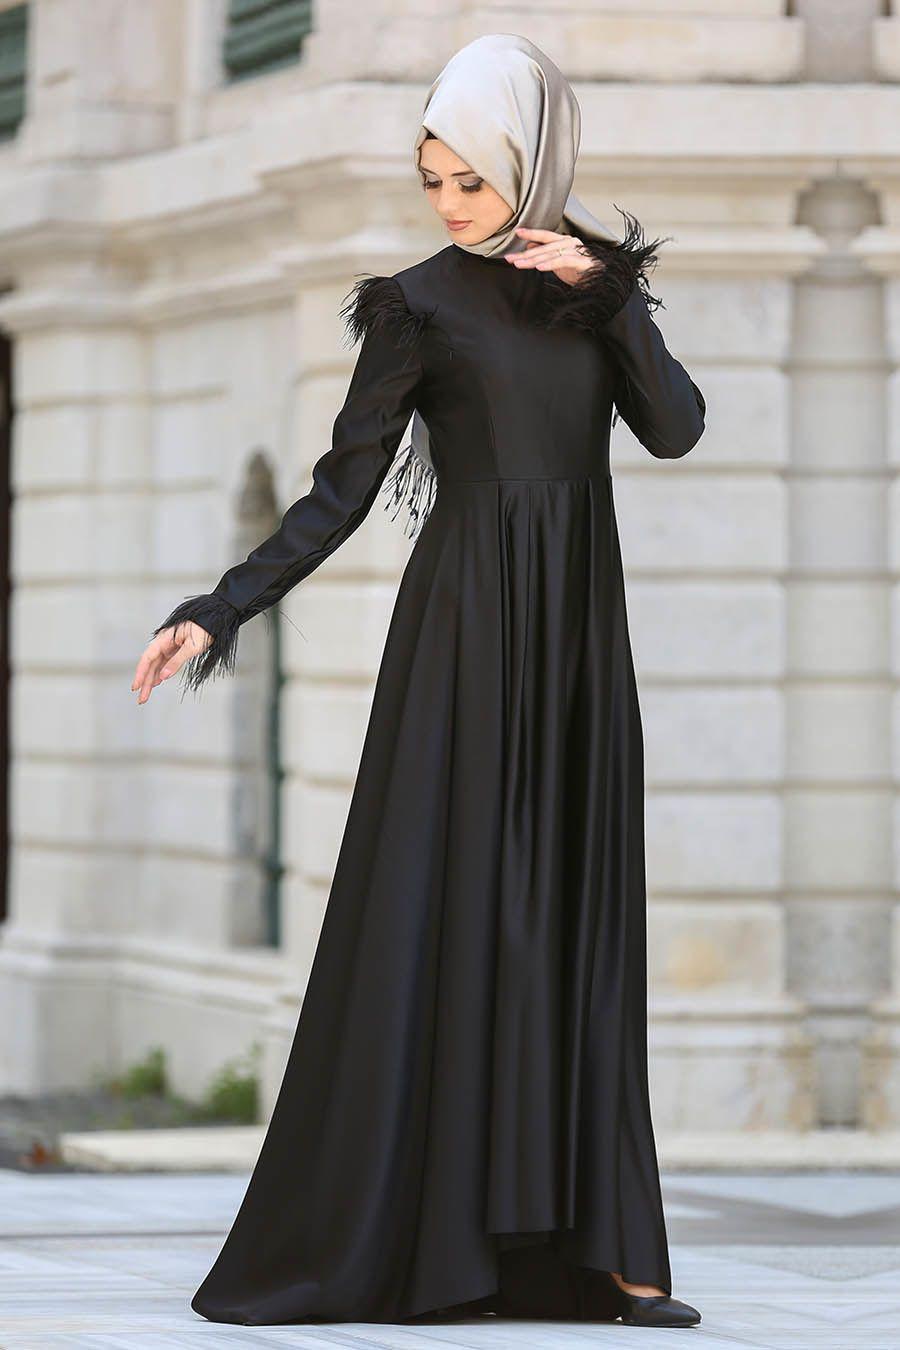 2d6d44a19bc7c Puane - Tüy Detaylı Siyah Tesettür Abiye Elbise 8181S   Abaya ...